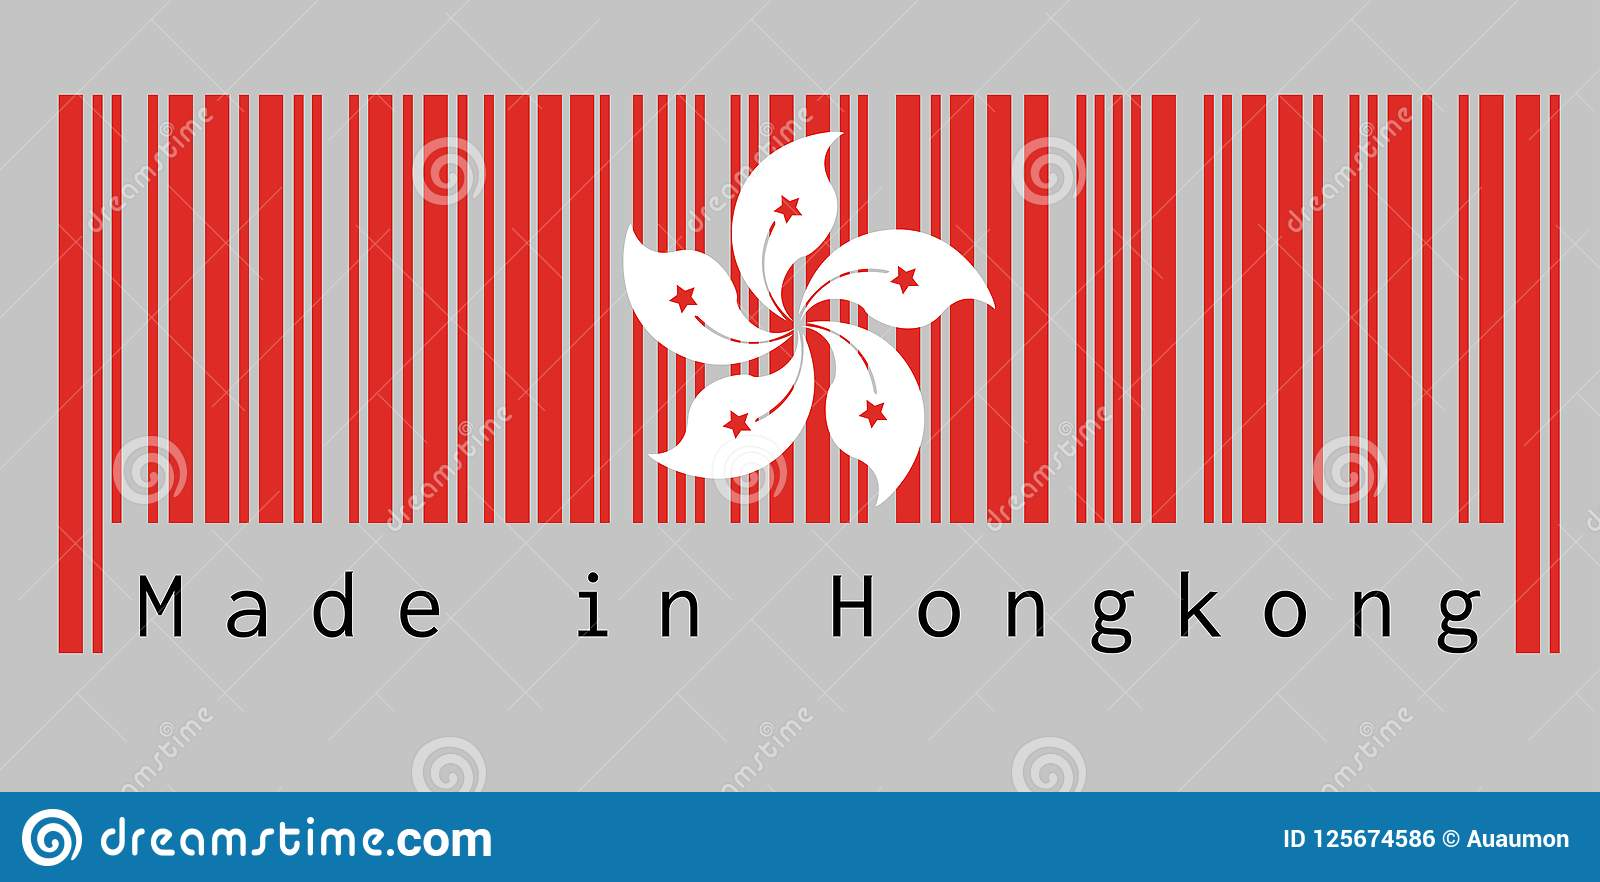 Barcode set the color of hong kong flag the red and white five barcode set the color of hong kong flag the red and white five petal bauhinia mightylinksfo